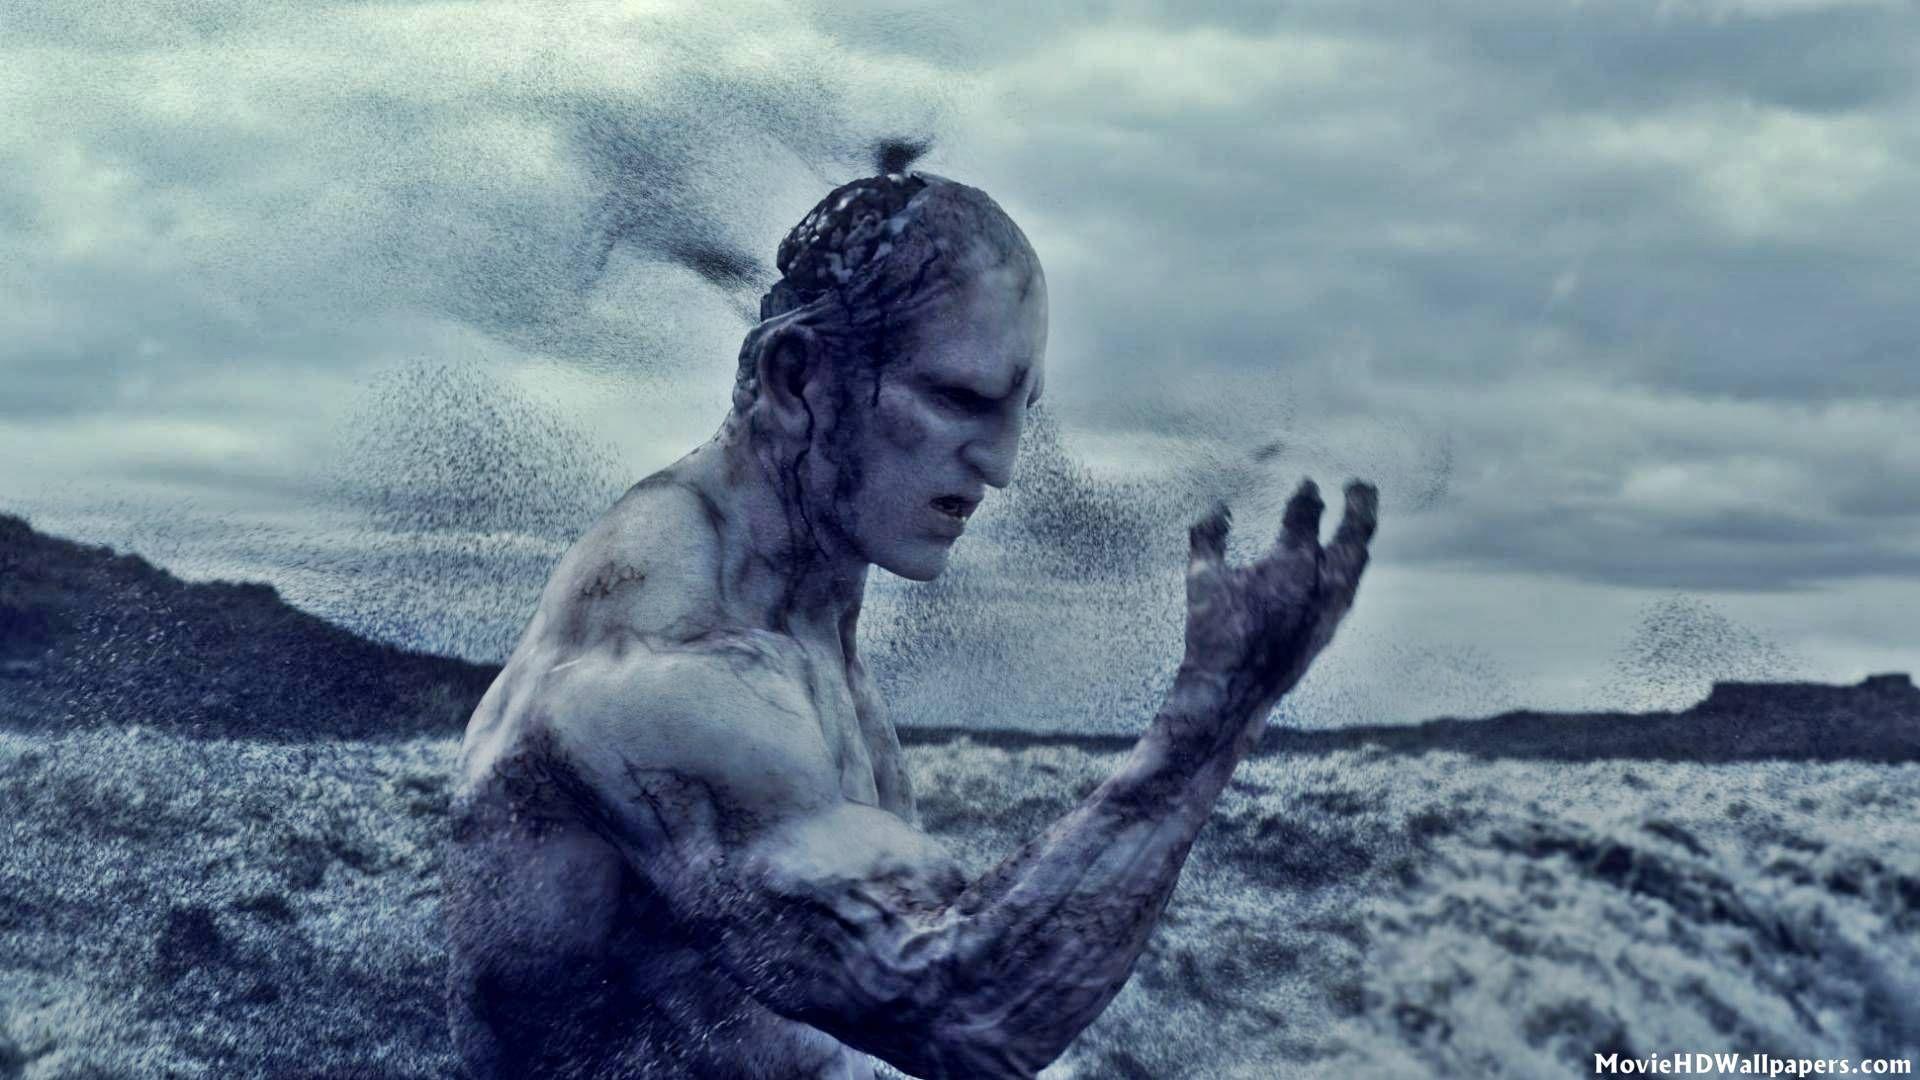 Prometheus Film Images Prometheus Wallpaper Hd Wallpaper